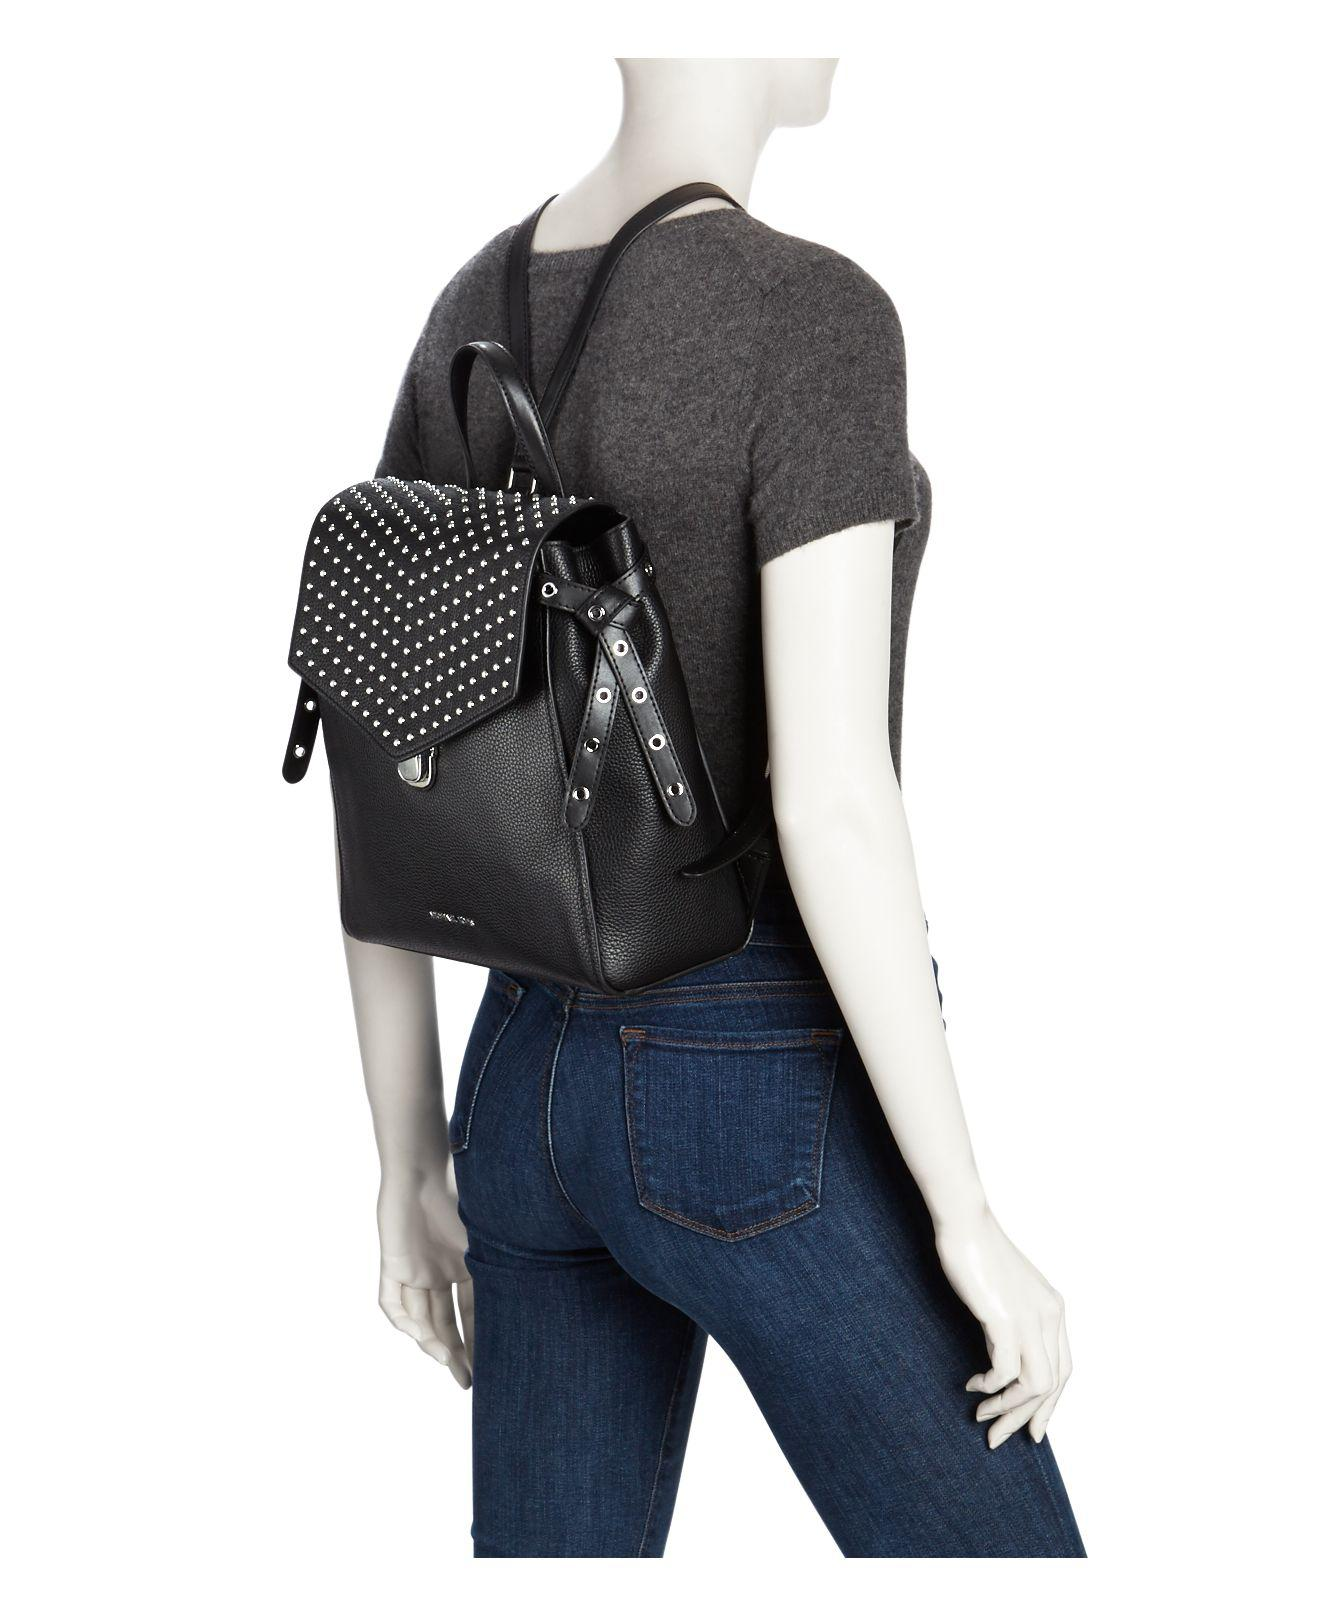 2f285b2f8cff2 ... shopping lyst michael michael kors bristol medium leather backpack in  black 8795b ab2fc